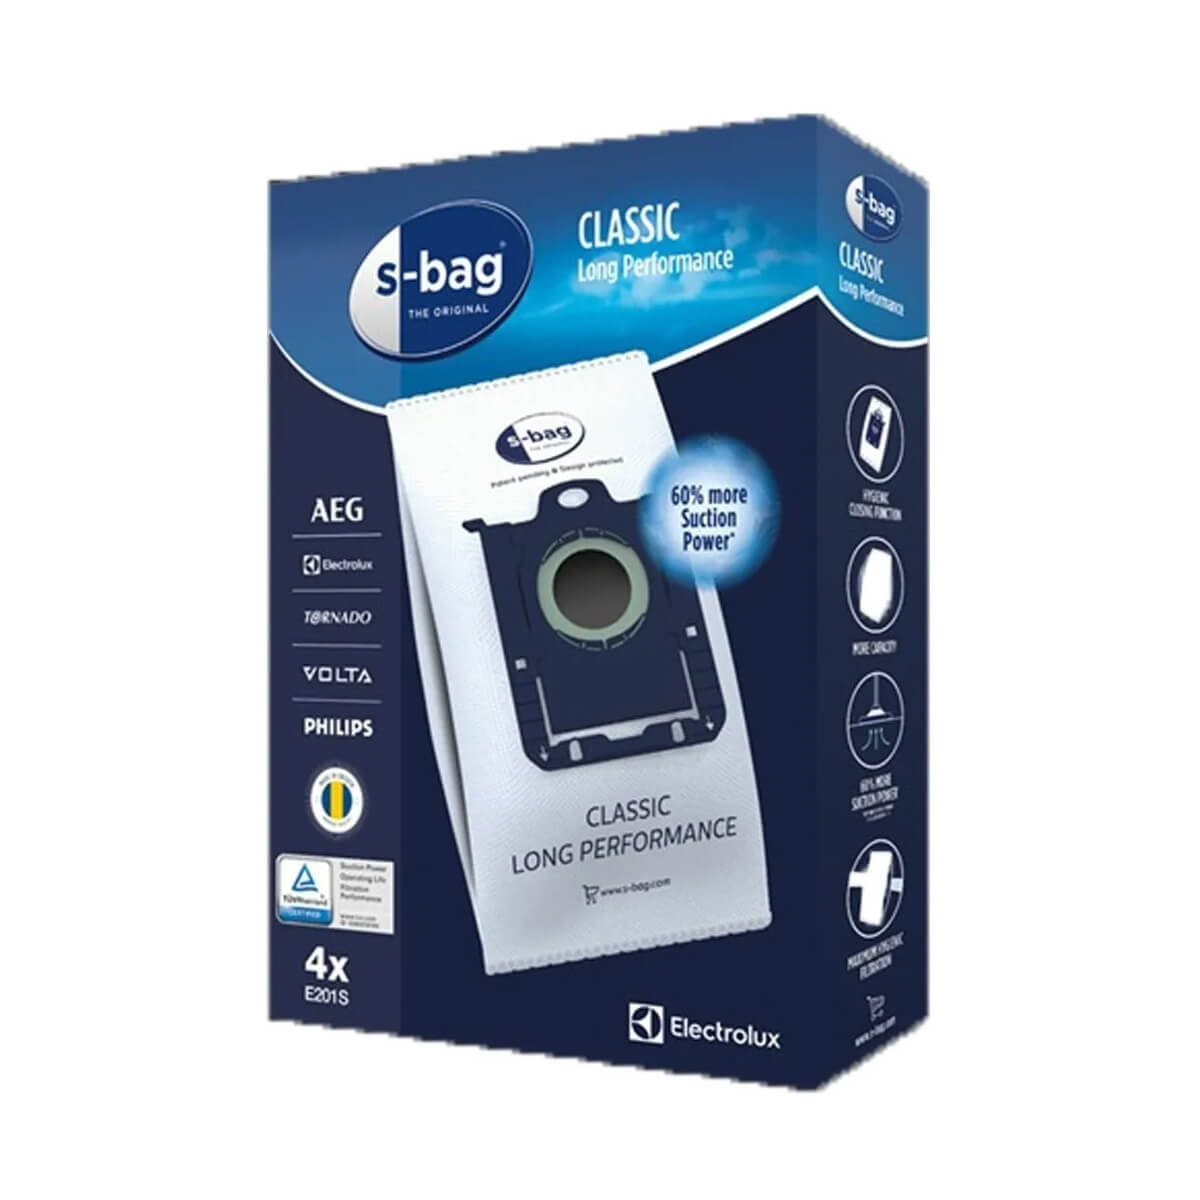 4 Sacos S-BAG Para Aspirador de Pó Electrolux - DT3010BR005 A18079301